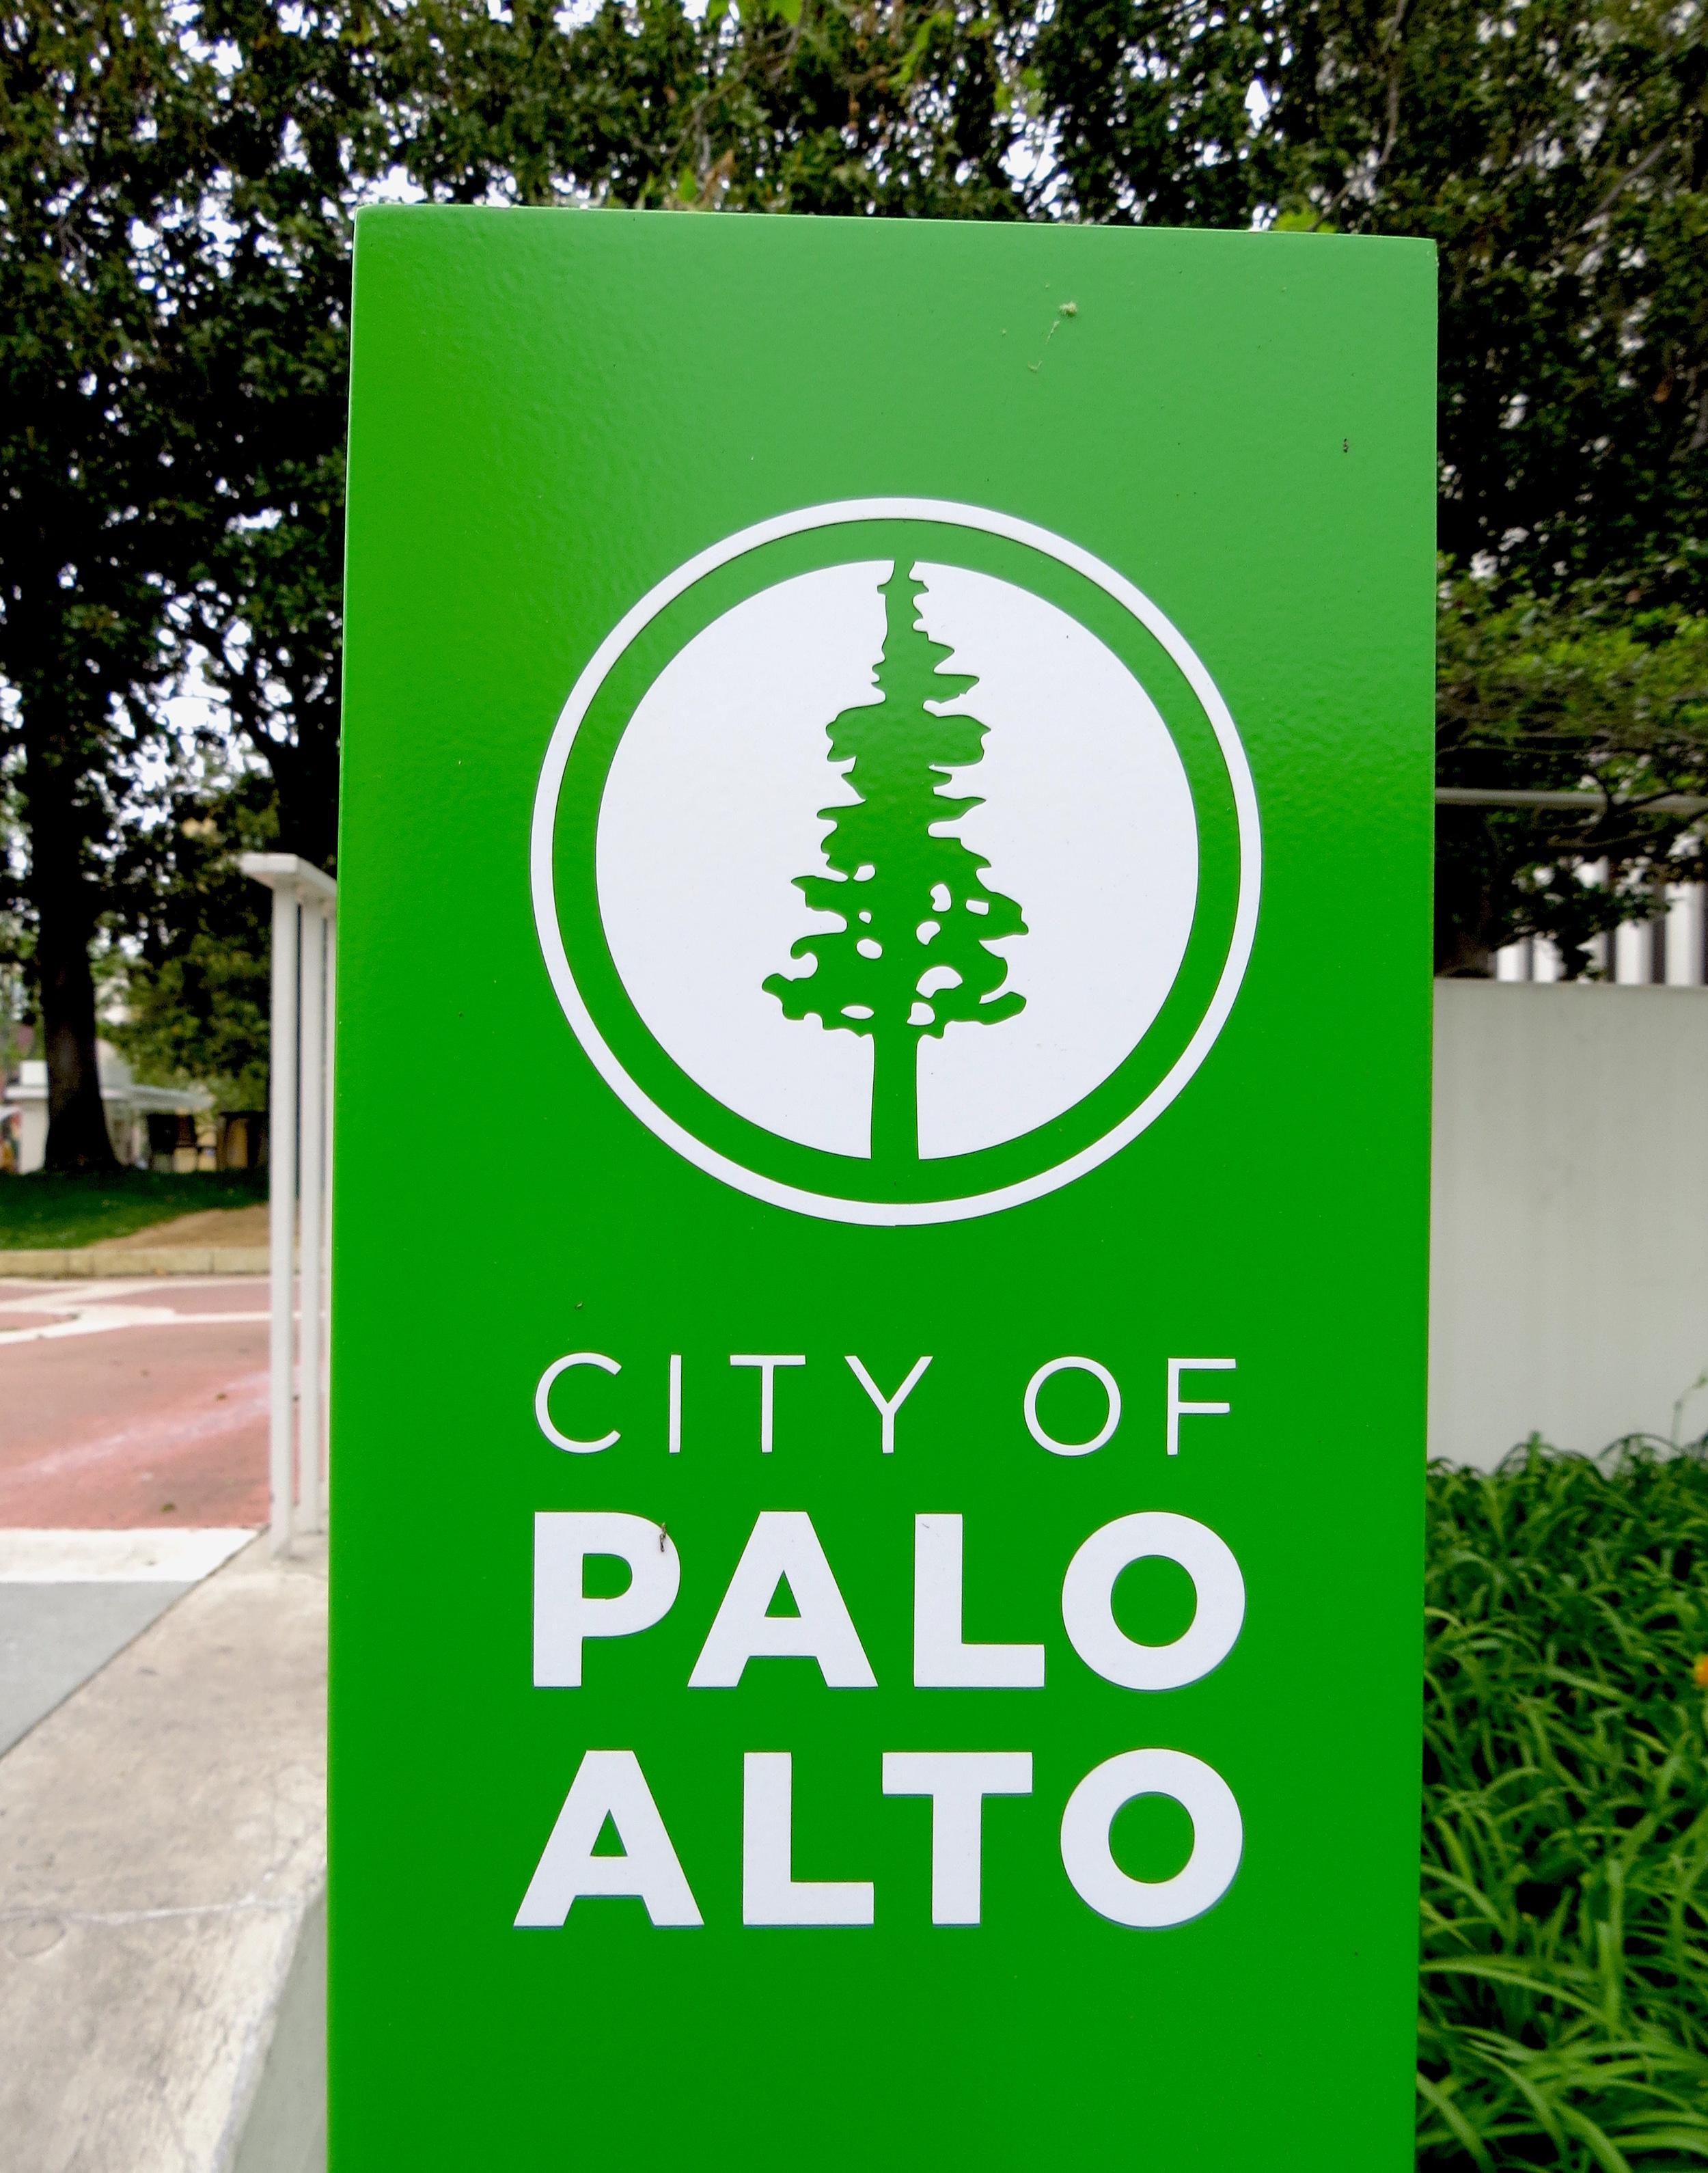 cityofpaloaltosign.jpg